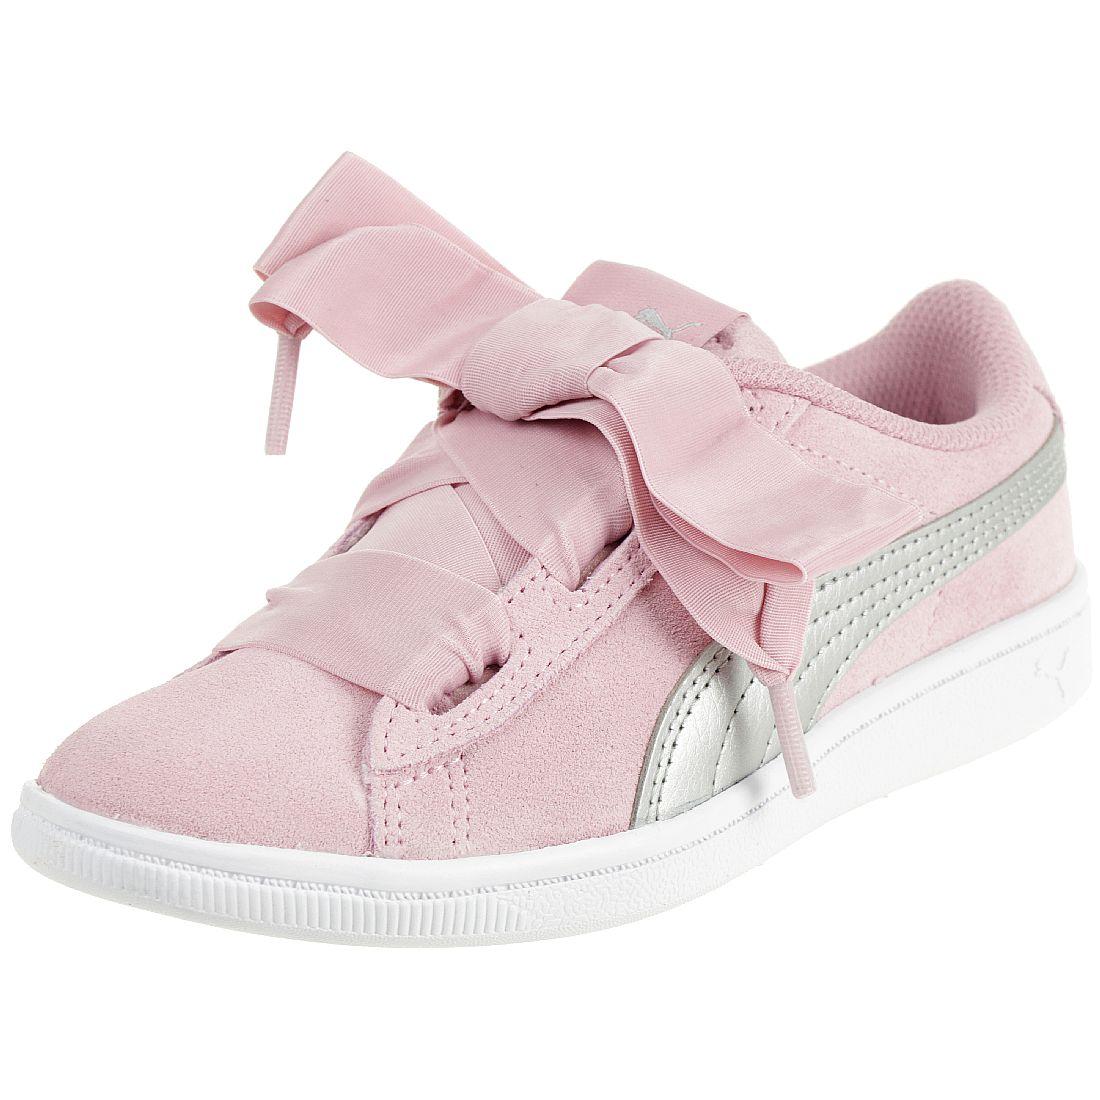 Puma Vikky Ribbon AC PS Sneaker Kinder Mädchen Schuhe Leder